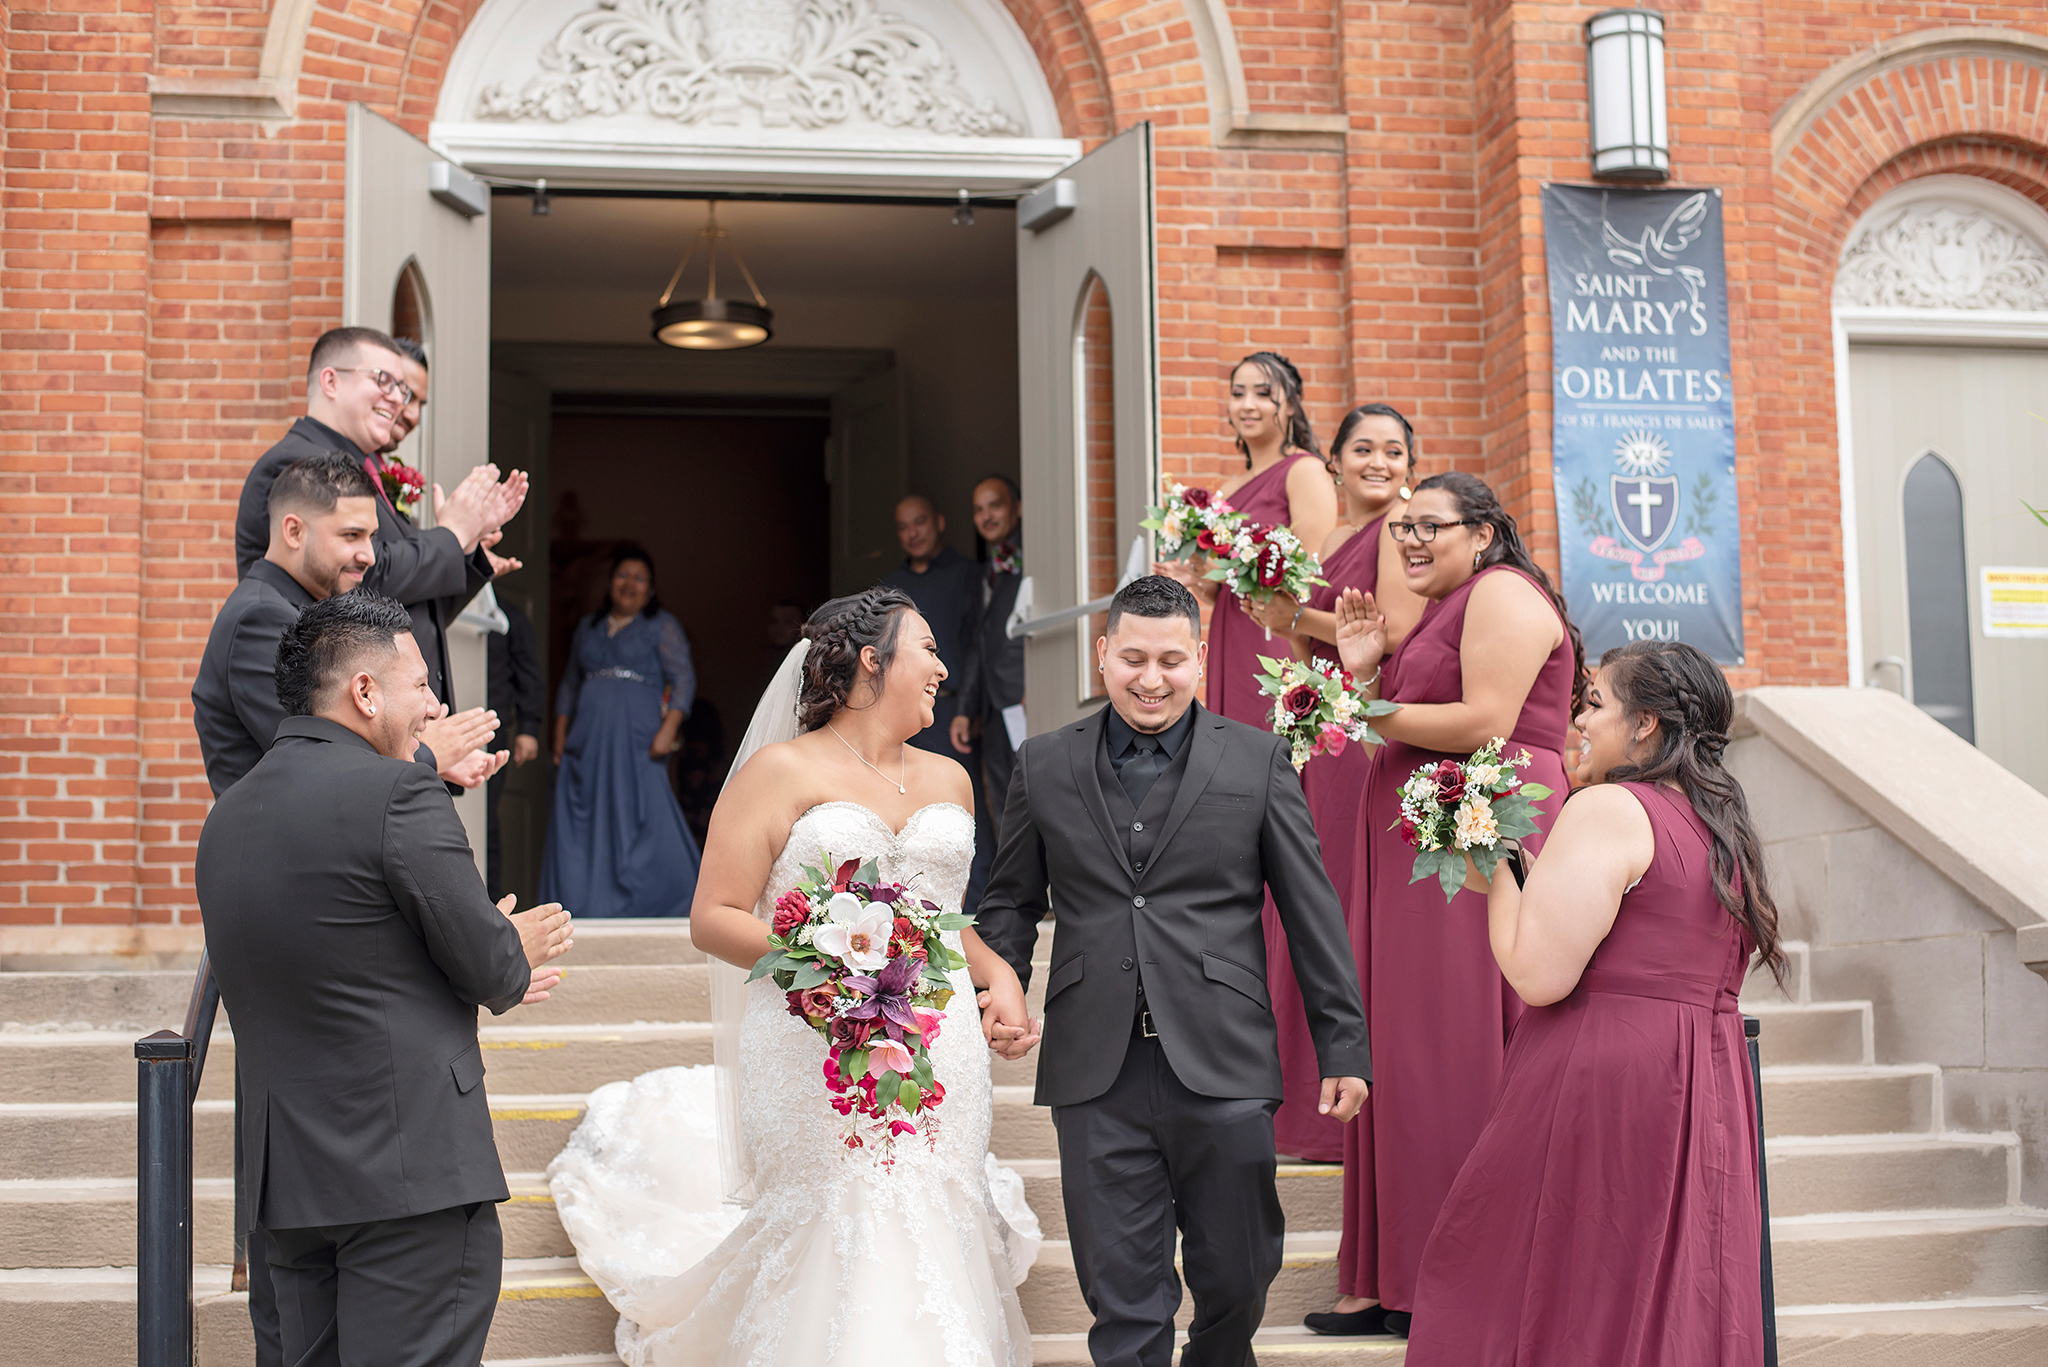 Lindsay-Adkins-Photography-Michigan-Wedding-Photographer-BernalBlog-7